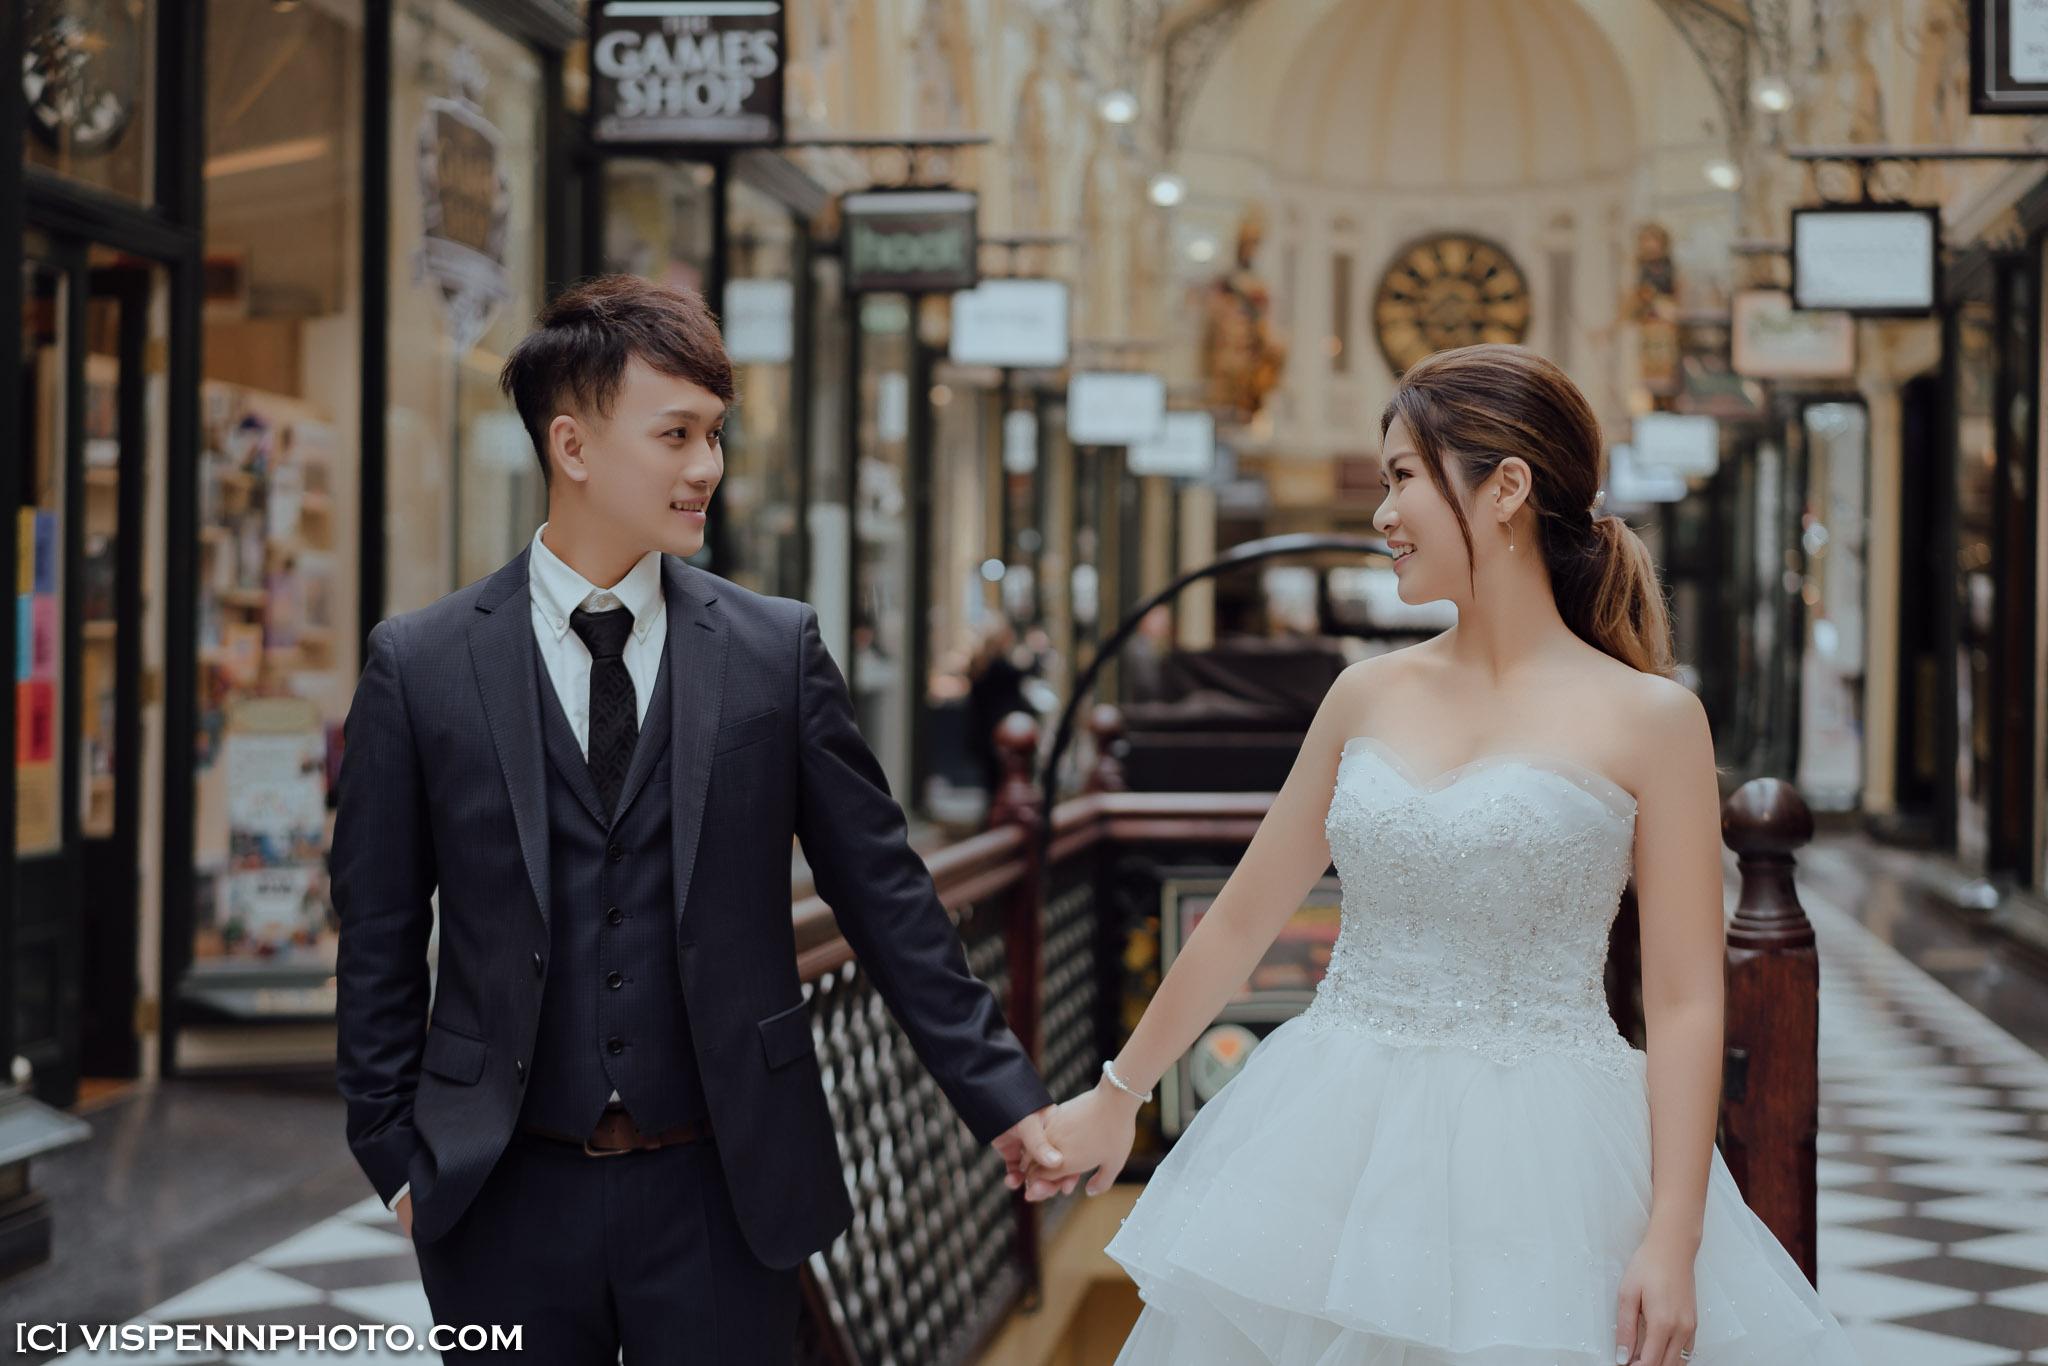 PRE WEDDING Photography Melbourne GiGi 2046 A7R3 ZHPENN